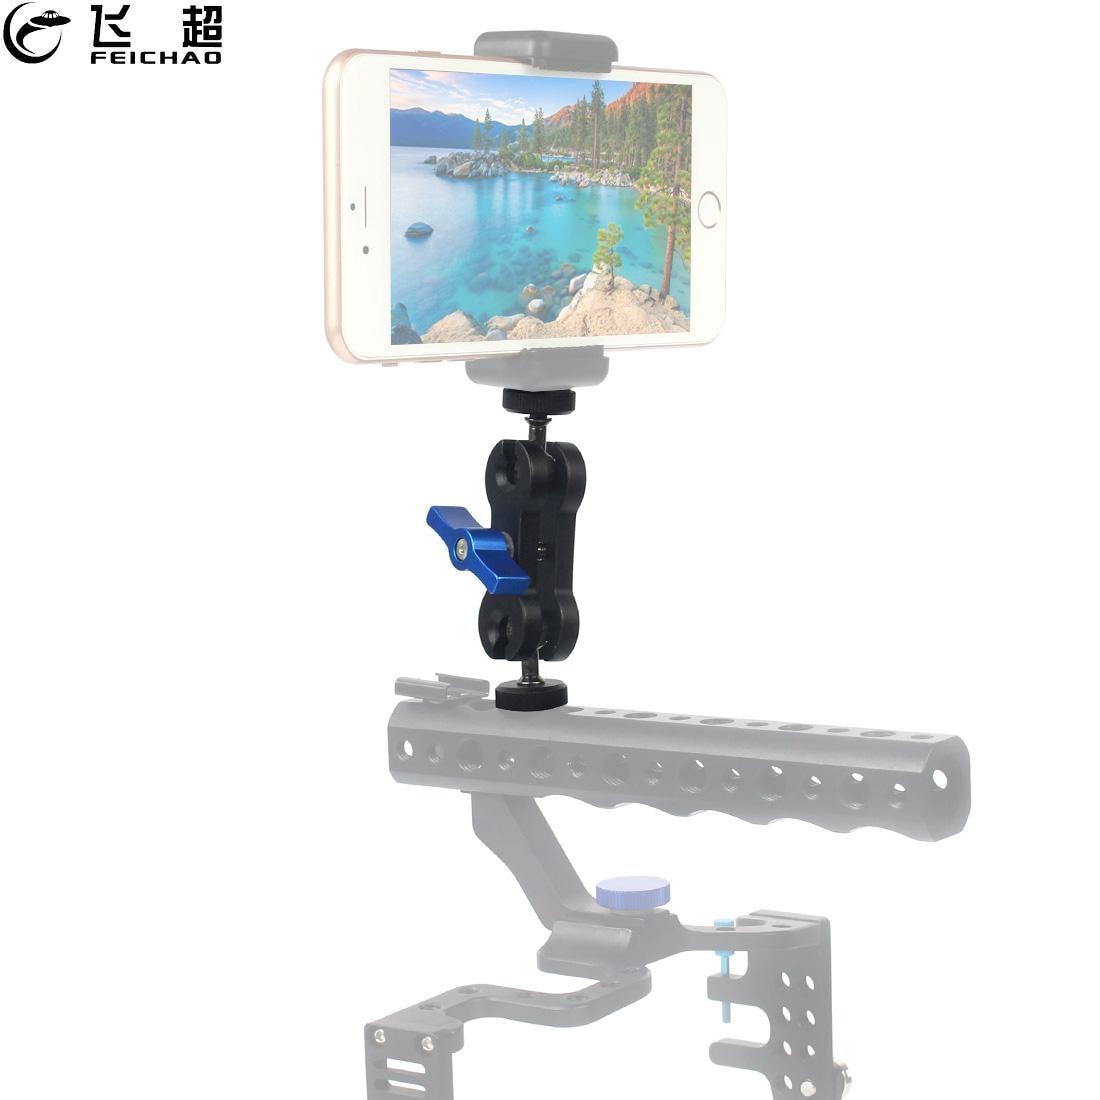 "Multi-Function Double Ball Head Bracket 360 Magic Arm Mount 1/4"" Tripod Adapter CNC for Monitor LED Light DSLR Camera Accessory"